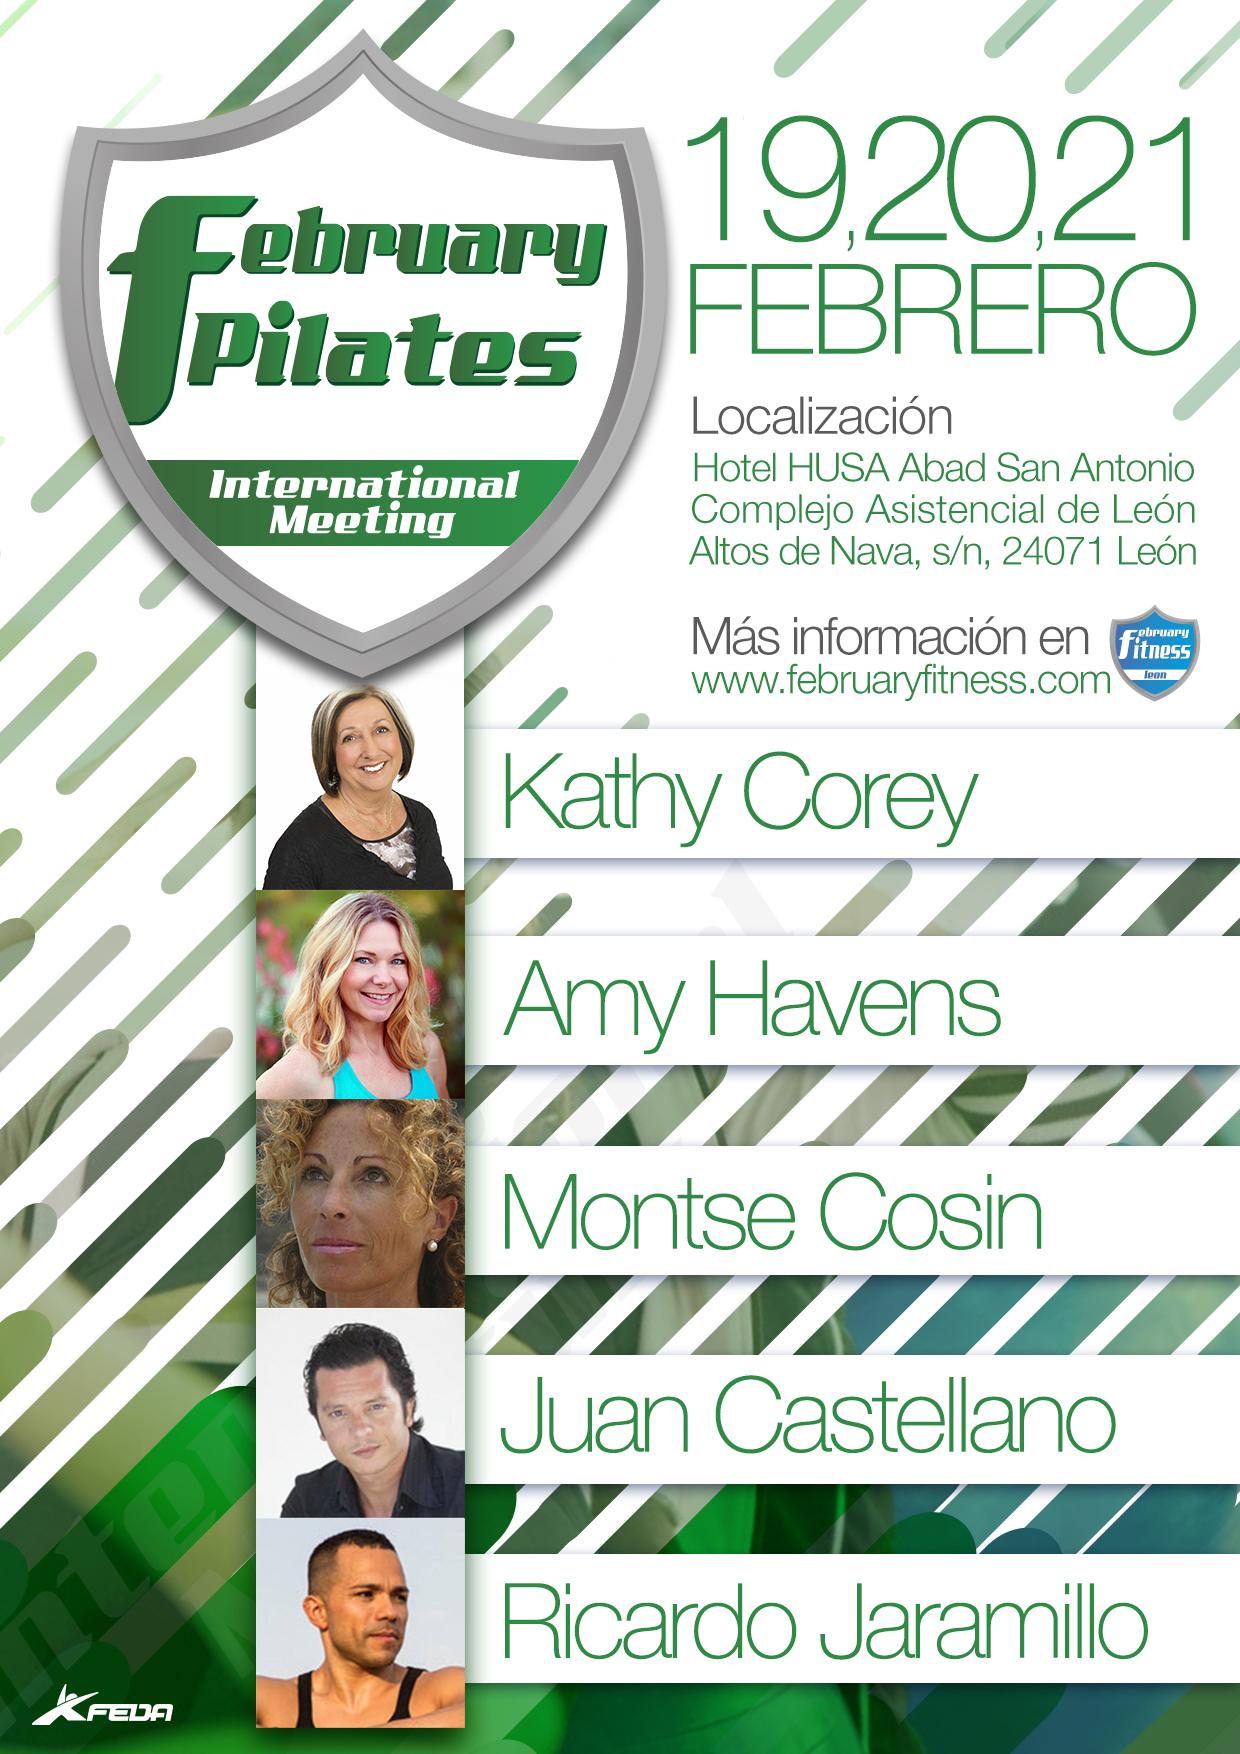 February Pilates International Meeting | Fuente Pilates